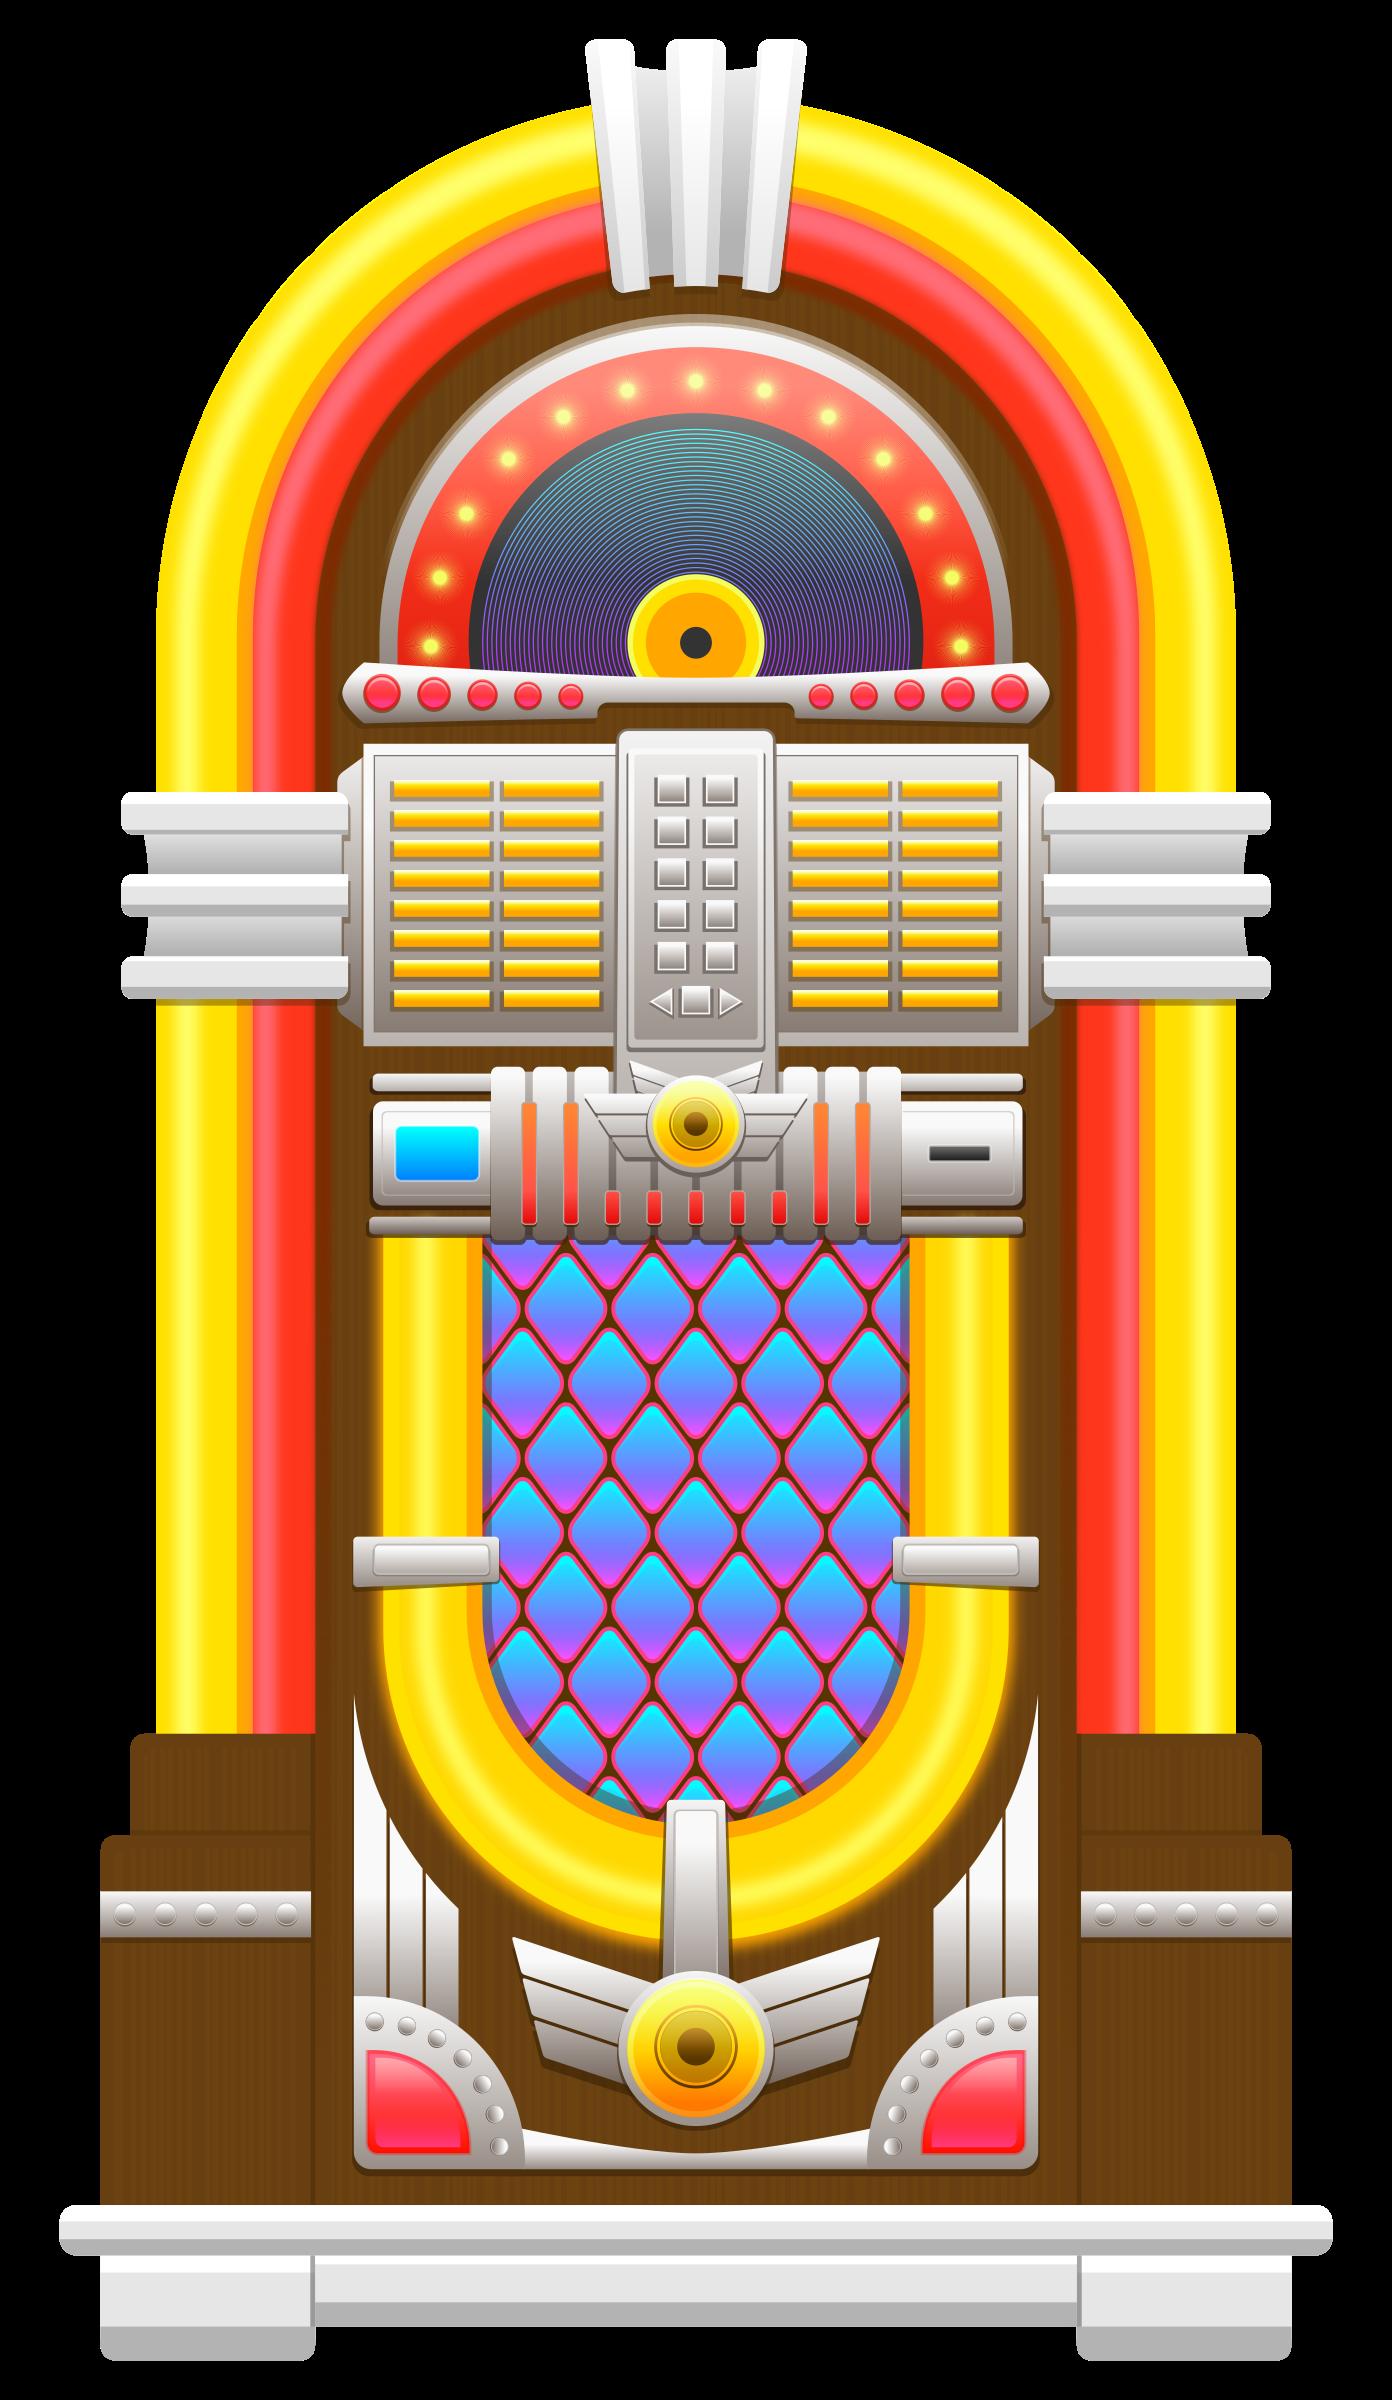 Jukebox clipart. Big image png